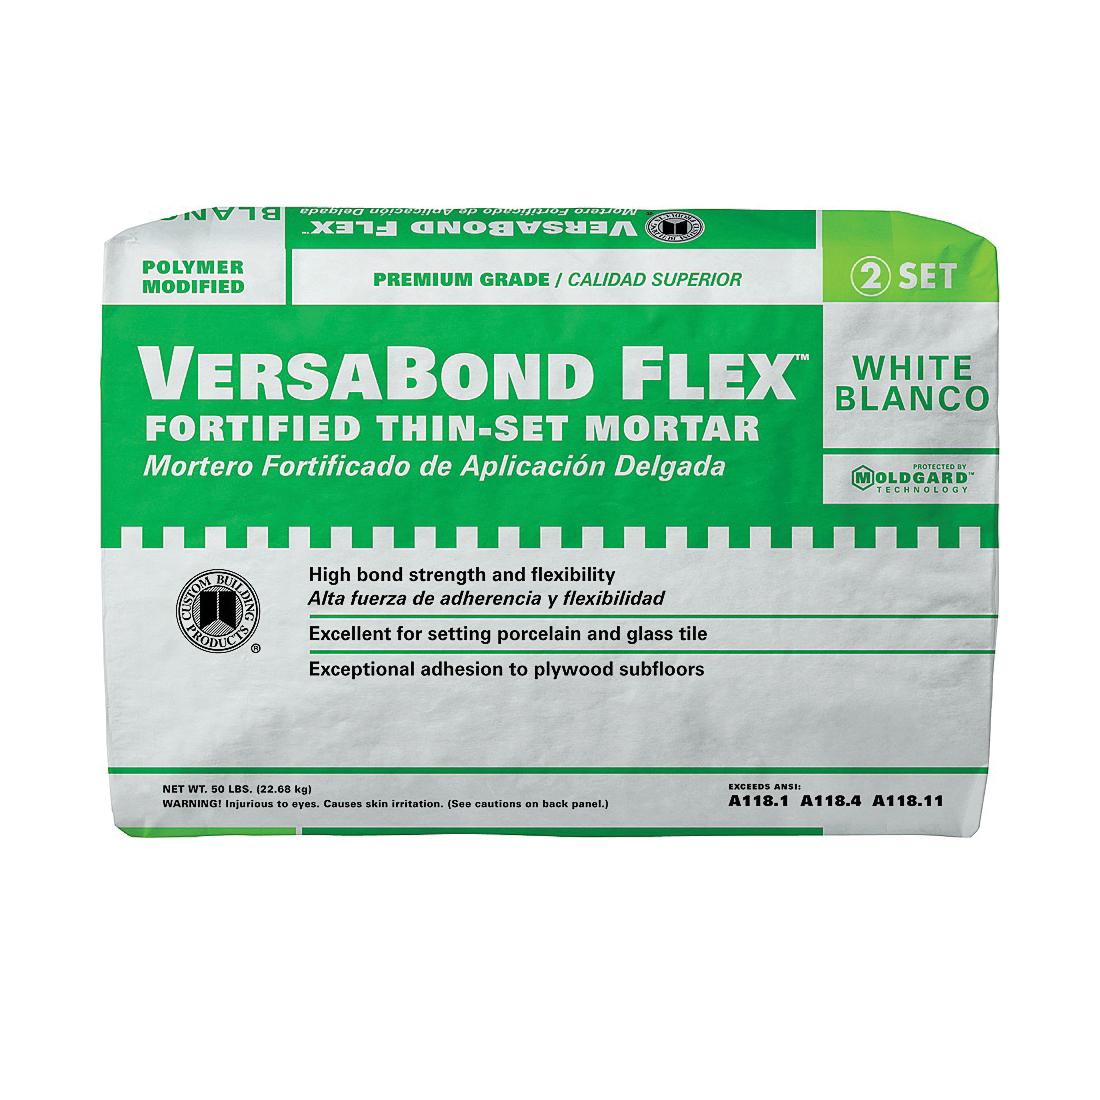 Picture of CUSTOM VersaBond Flex VBFW50 Thin-Set Mortar, White, Powder, 50 lb Package, Bag